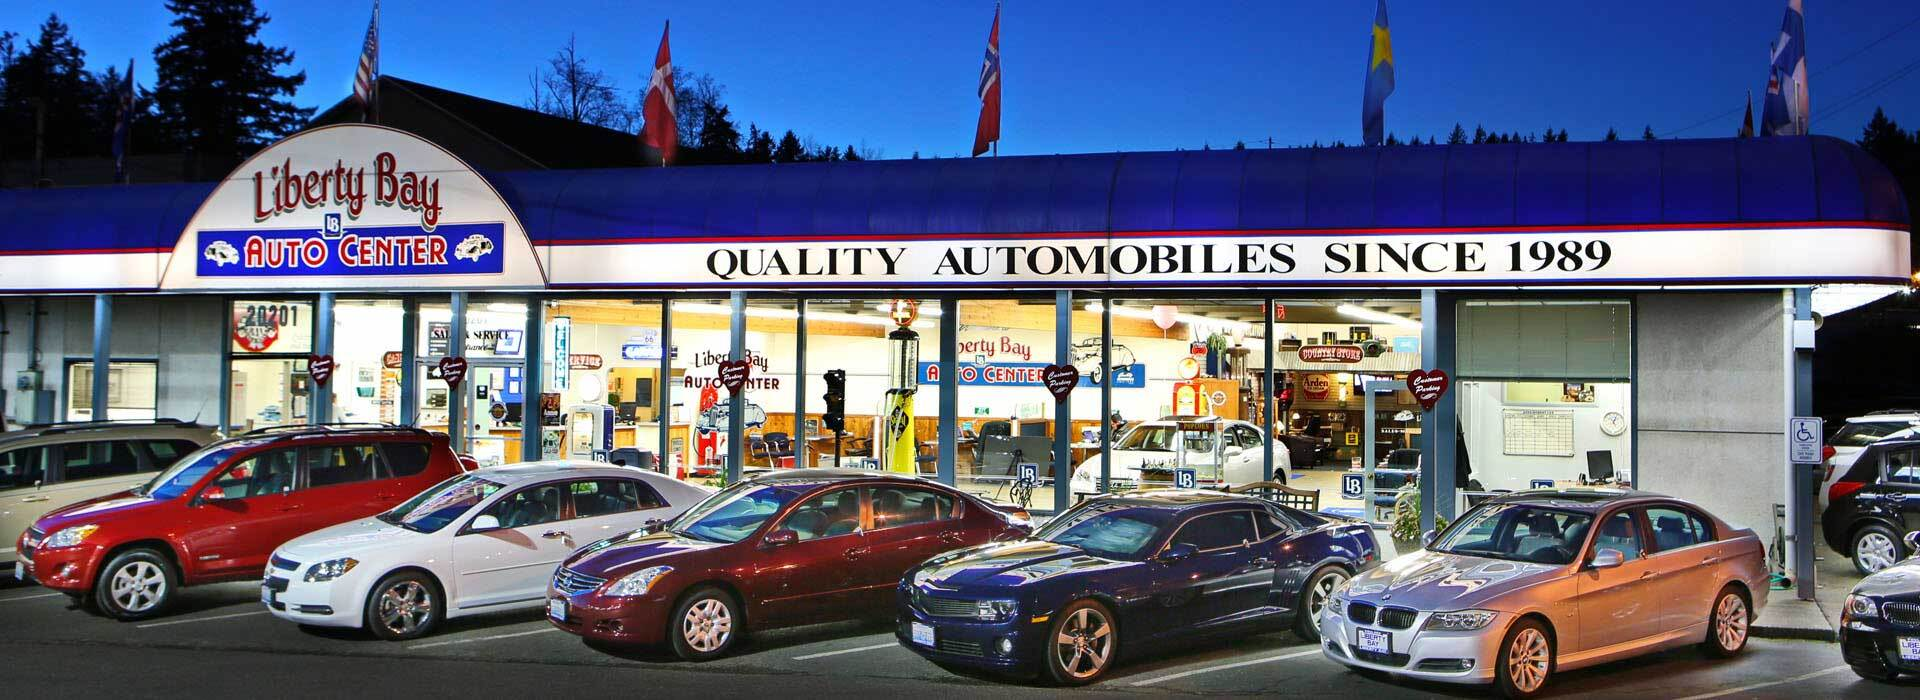 New York Car Dealerships Open Sunday